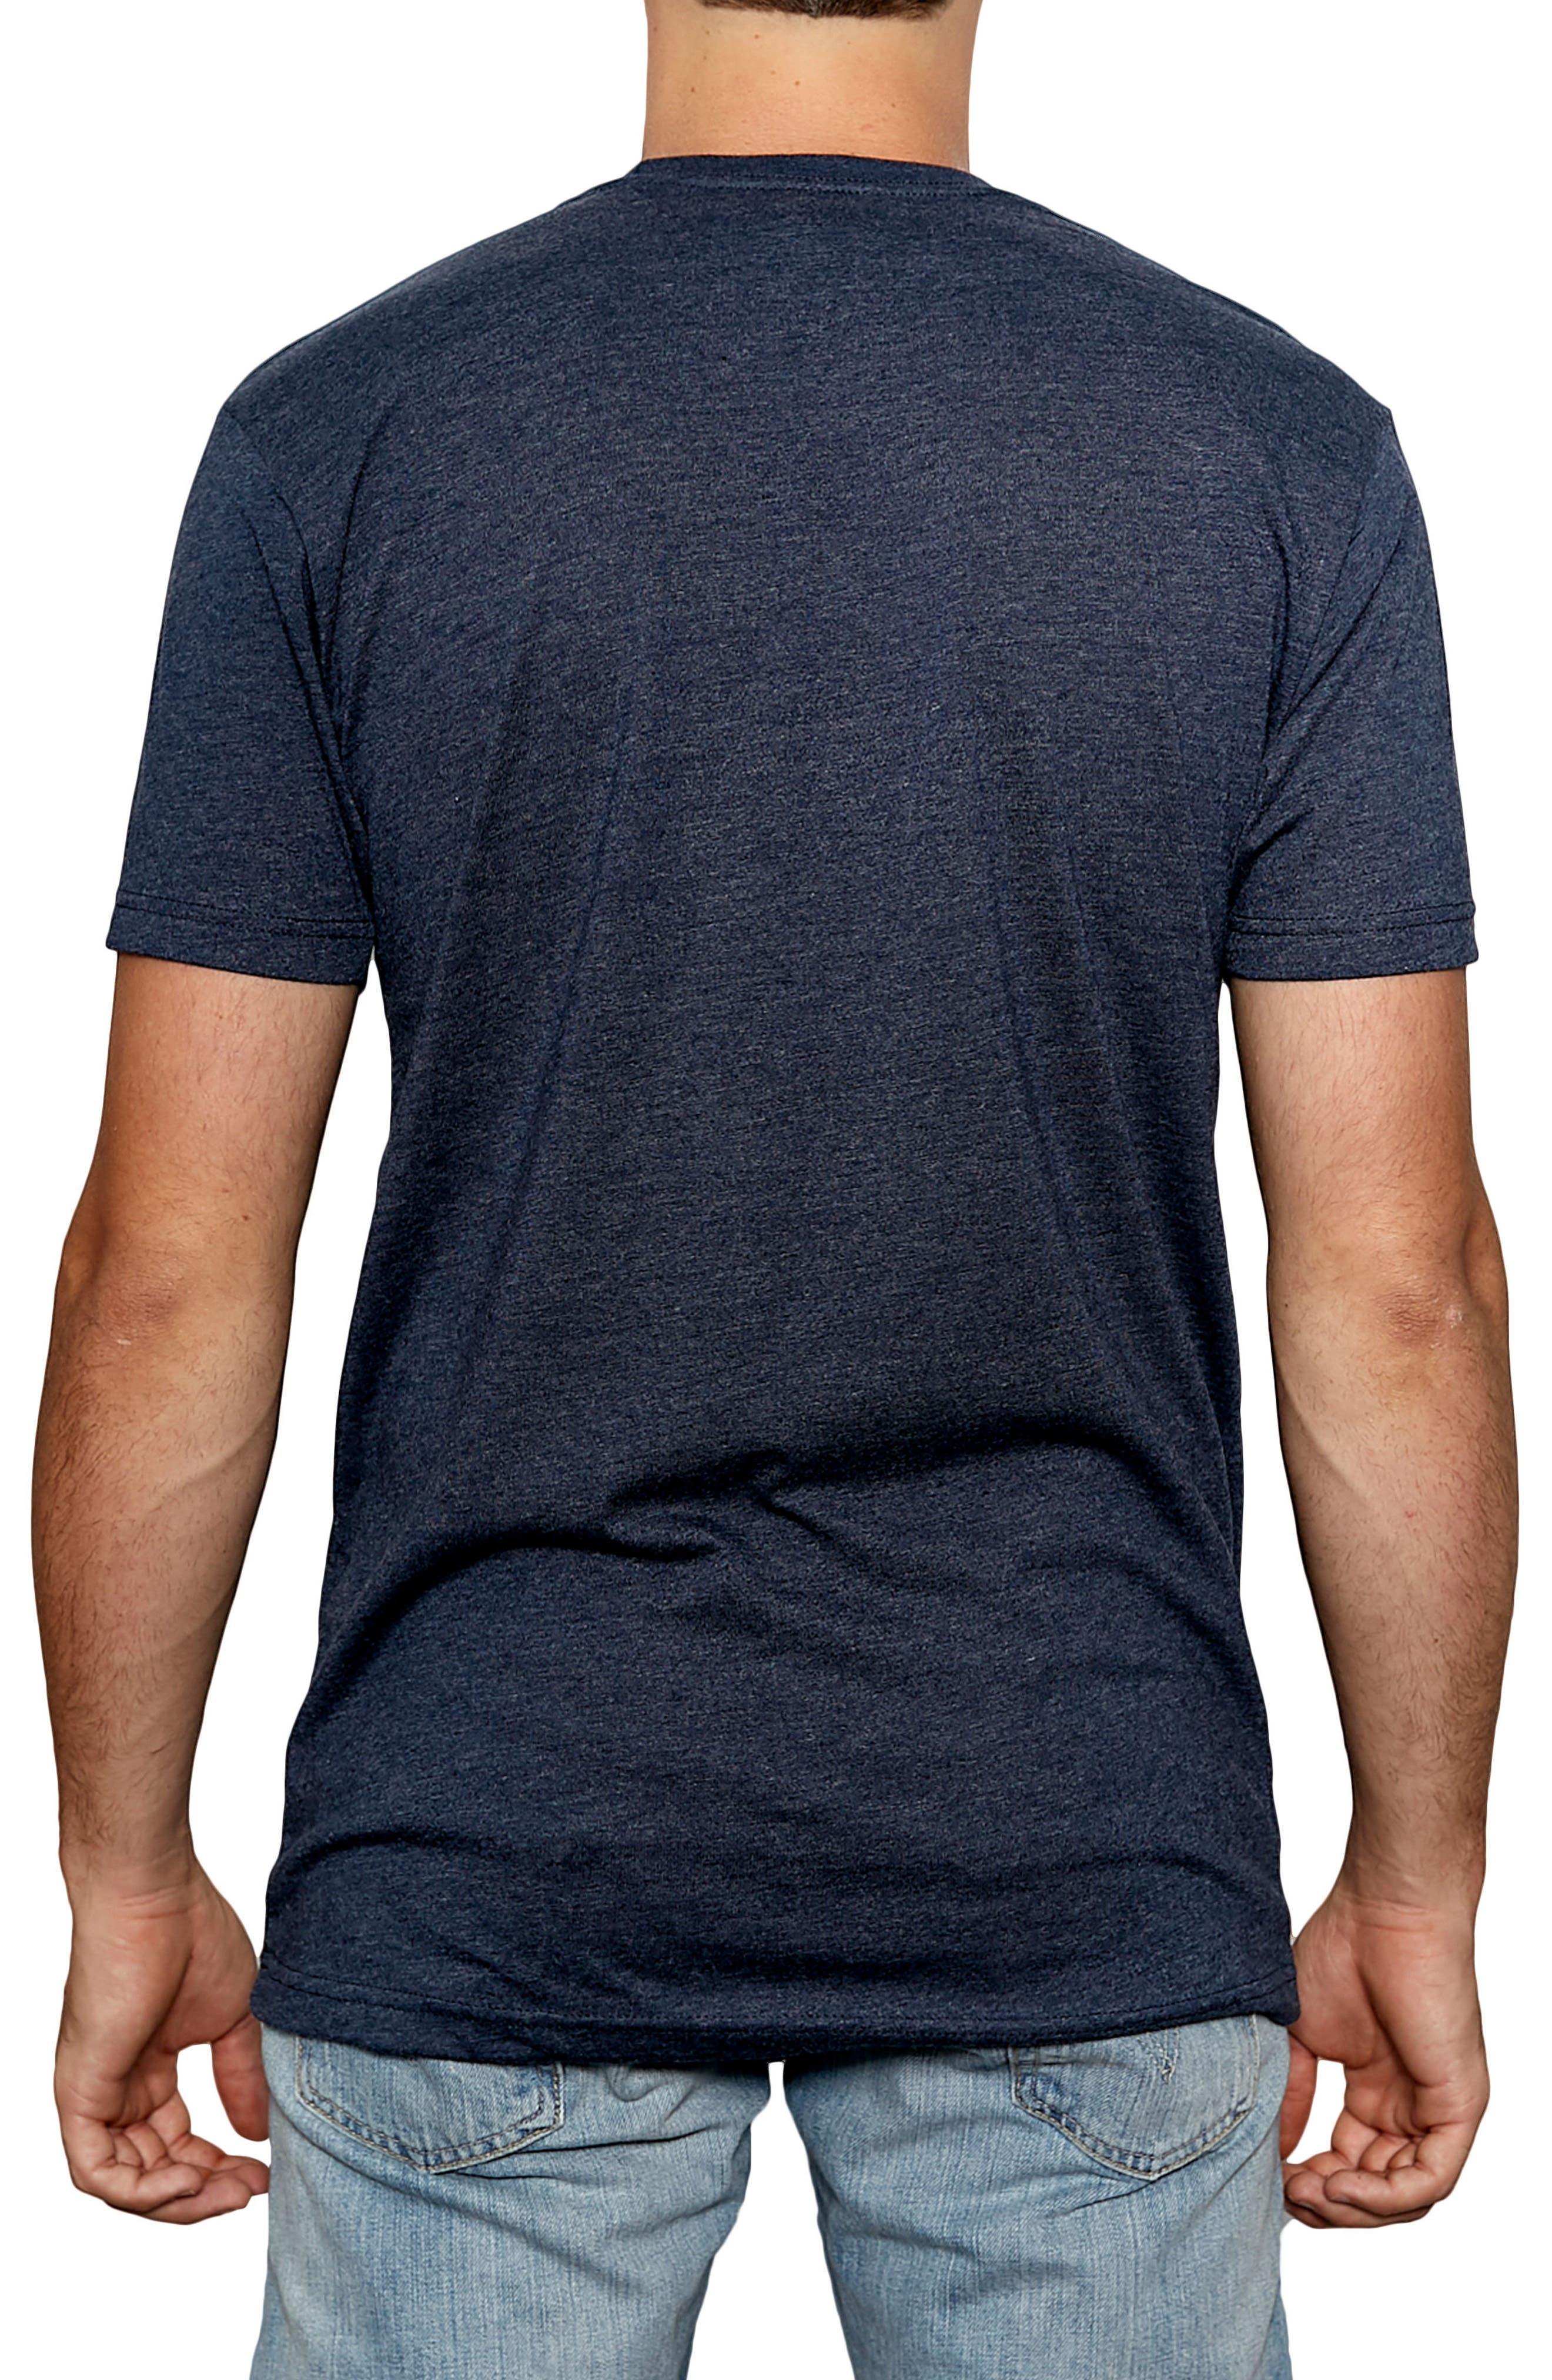 Adios Amigos Graphic T-Shirt,                             Alternate thumbnail 2, color,                             Navy